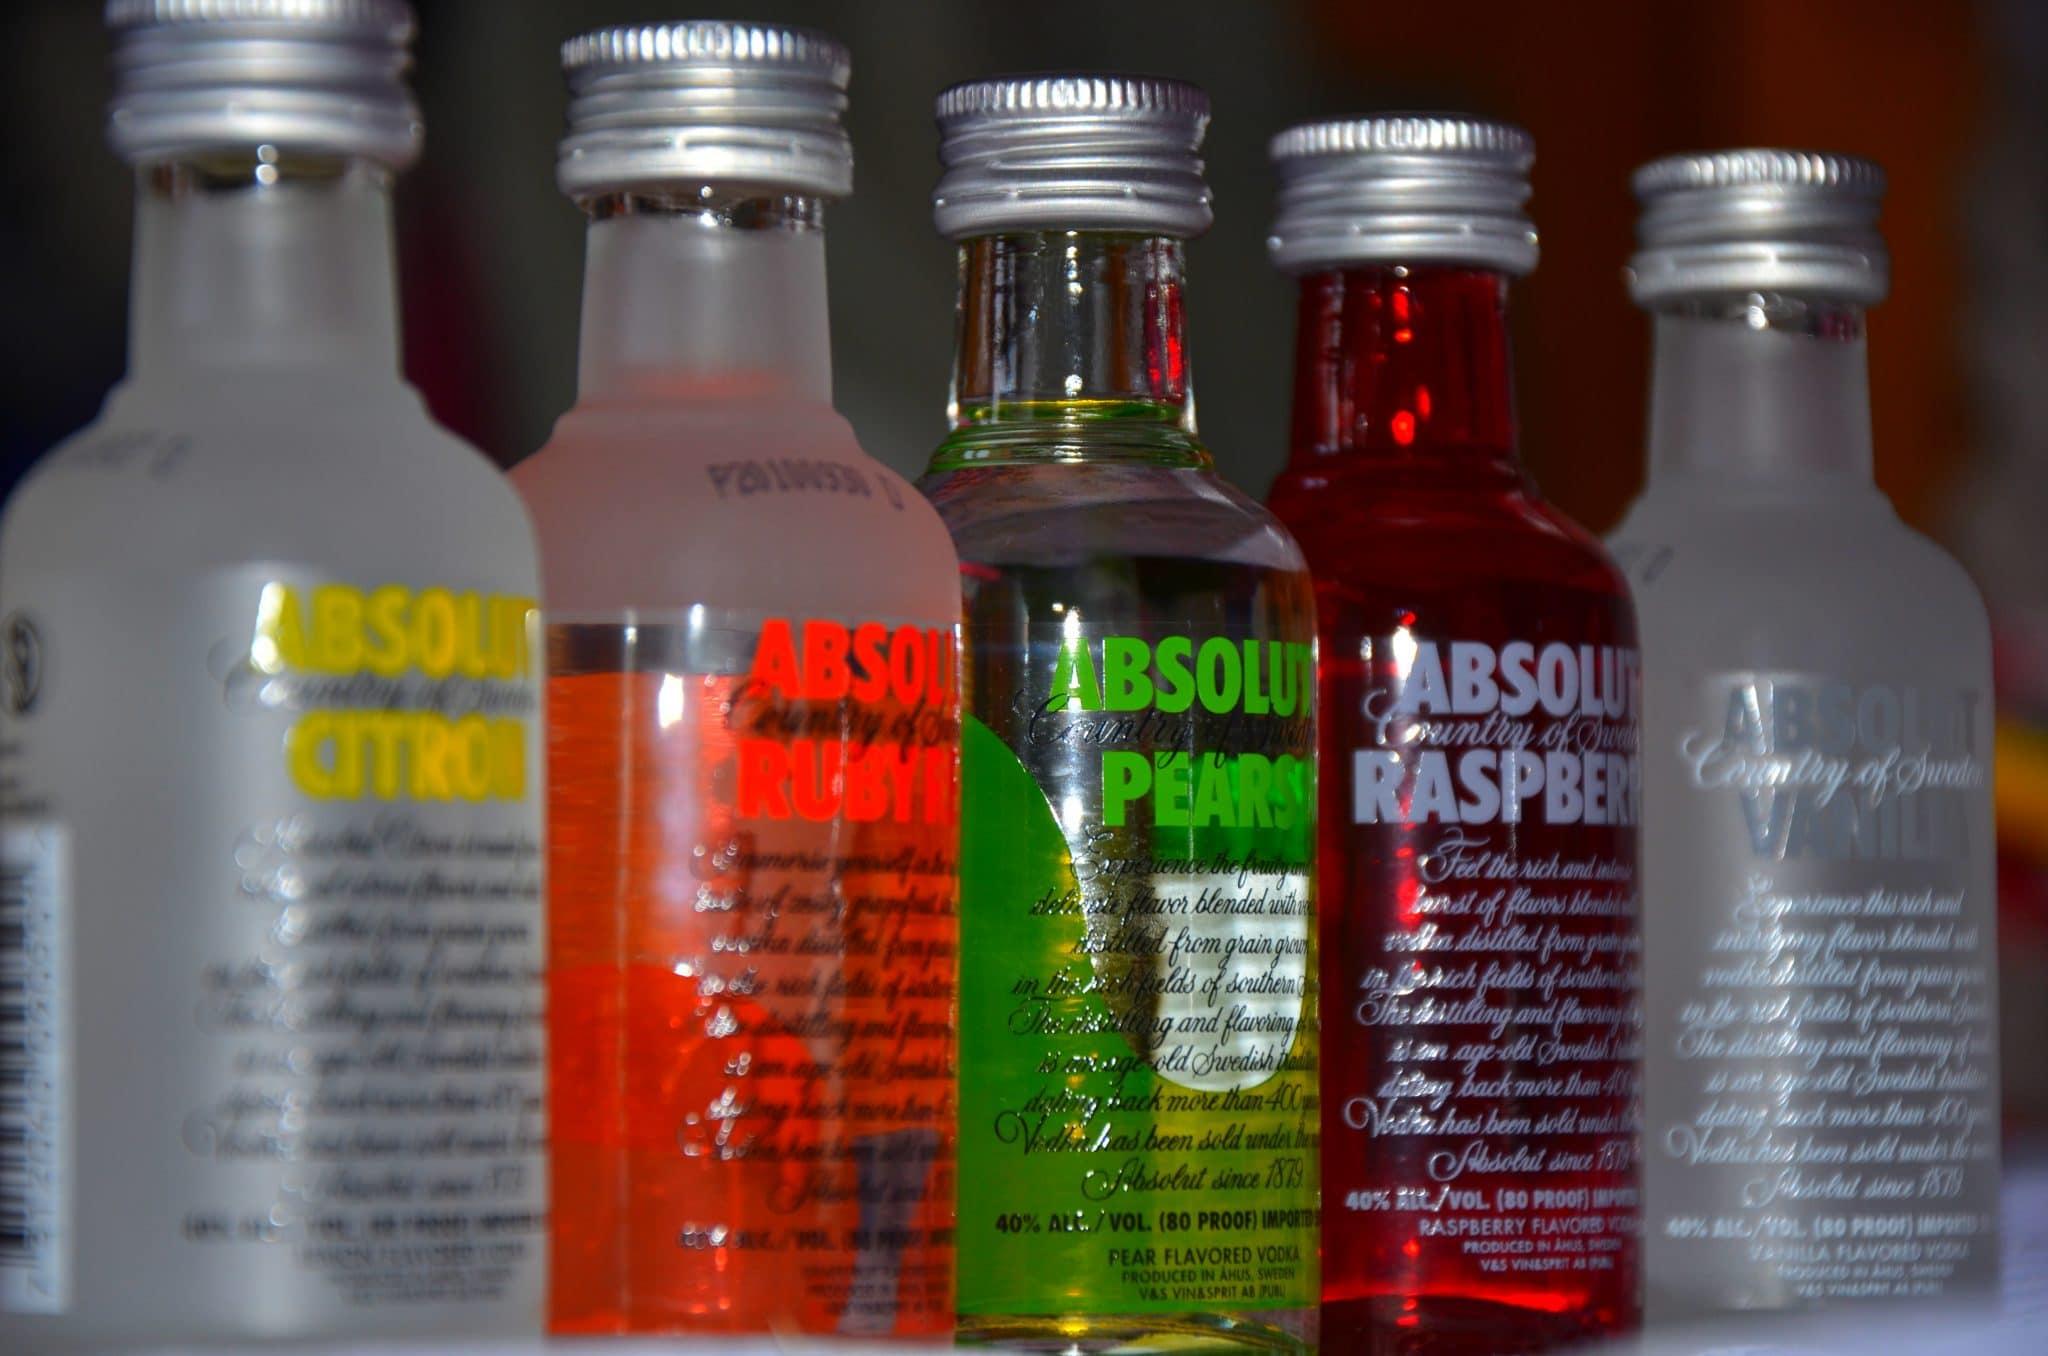 Best Potato Vodka - Top 10 List of the World's Finest Vodka Brands